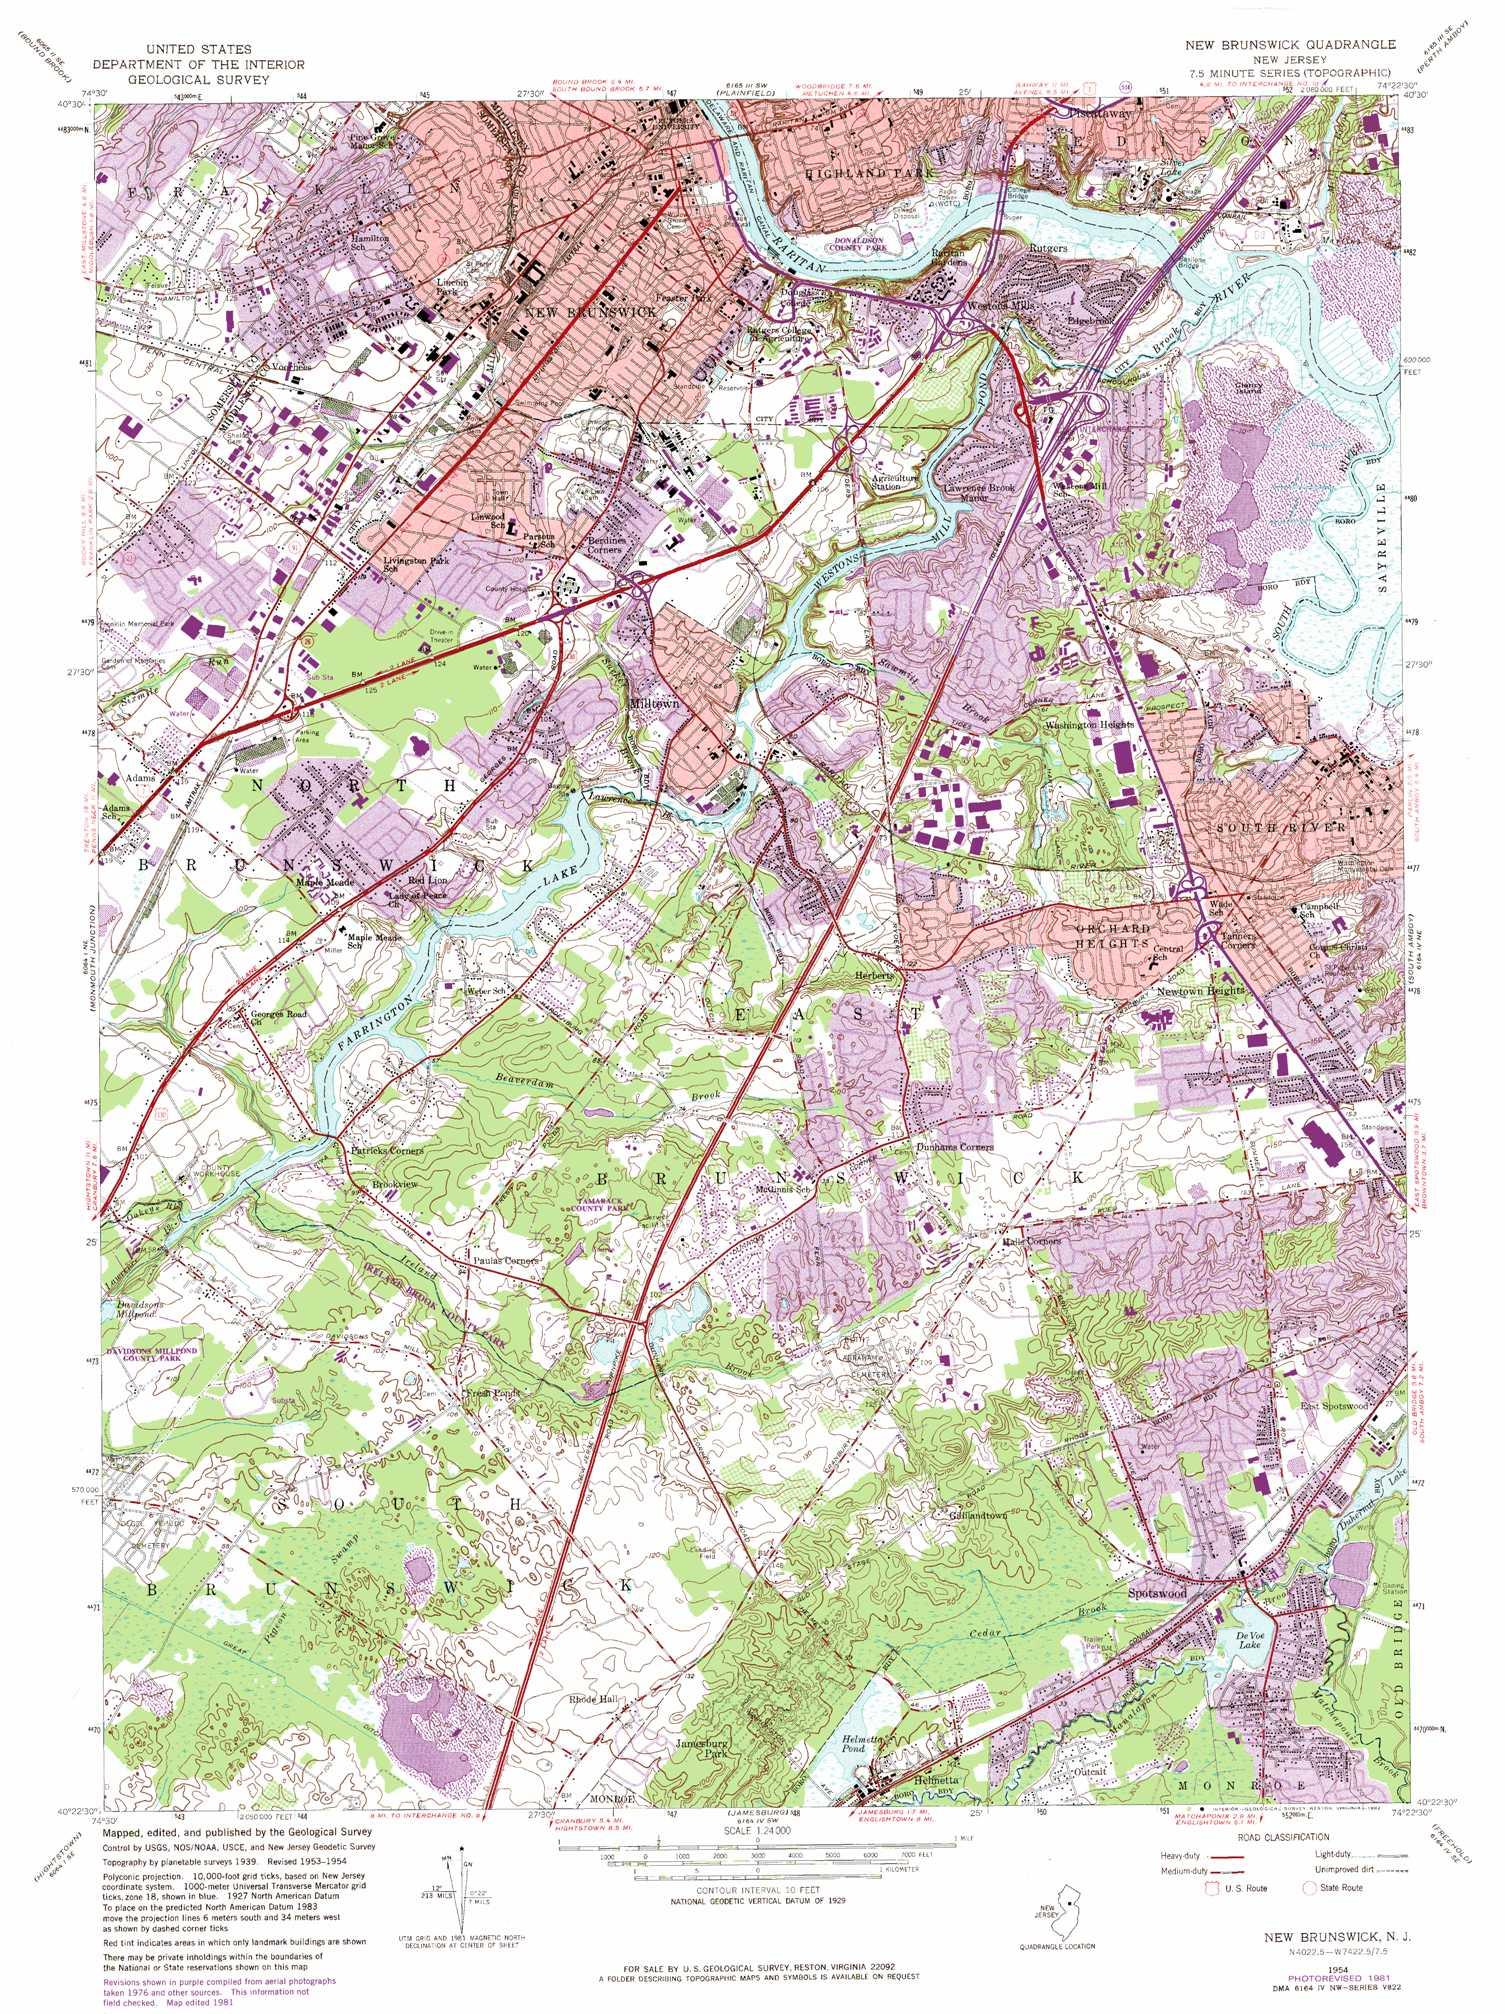 New Brunswick Topographic Map Nj Usgs Topo Quad 40074d4